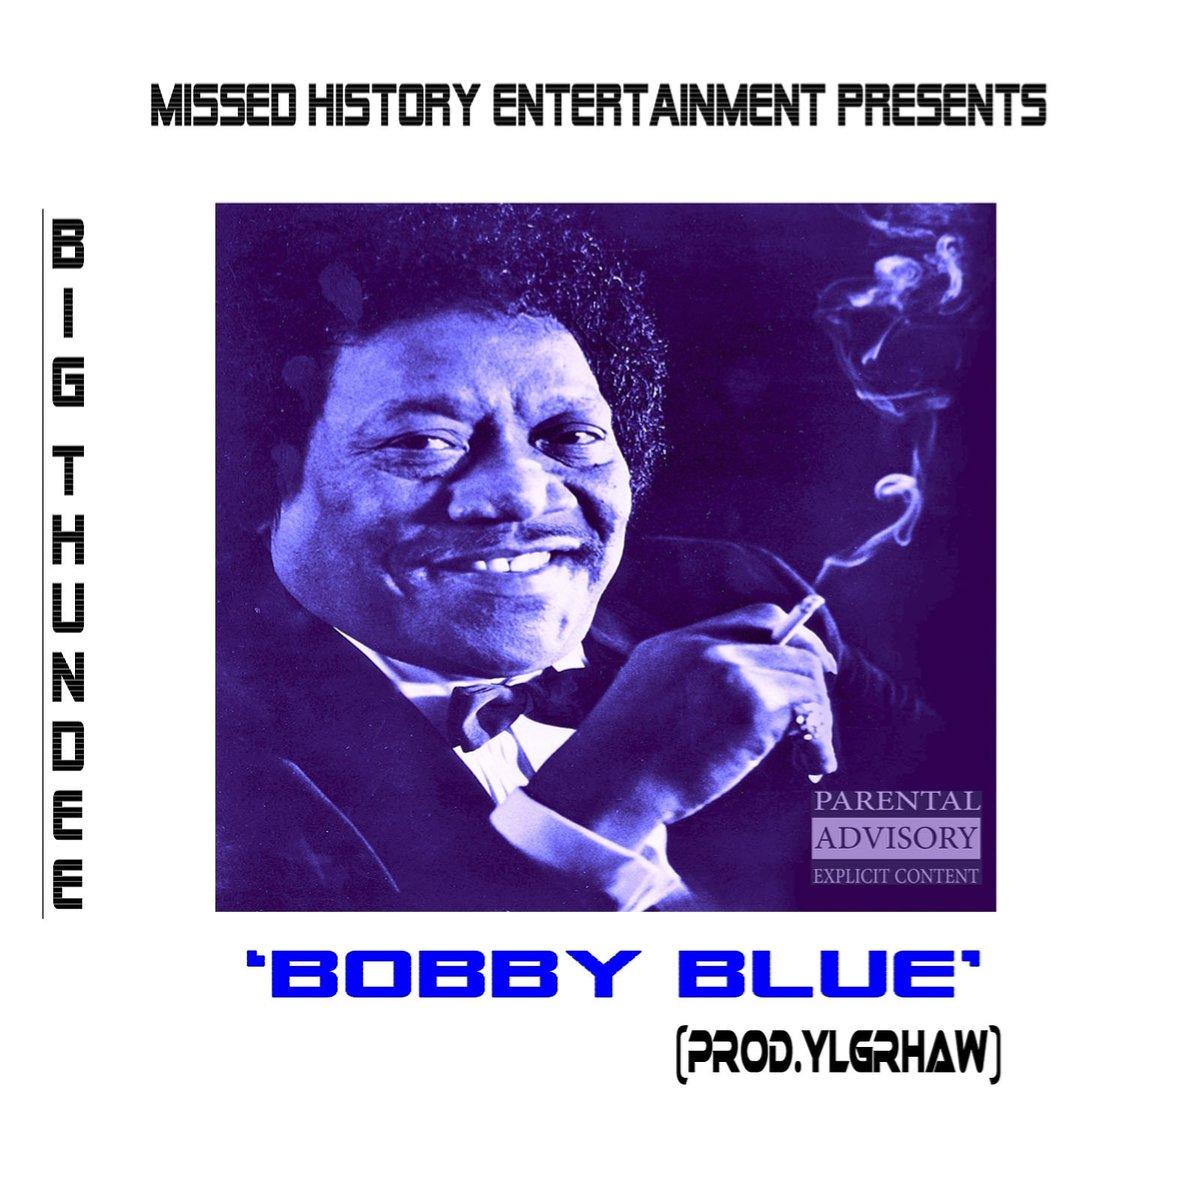 #rap #ohio #single #bobbyblue #bigthundee #comingsoon 2/24/2020@XXL @revolttv @MTV @Vevopic.twitter.com/D8O3bfsoOr